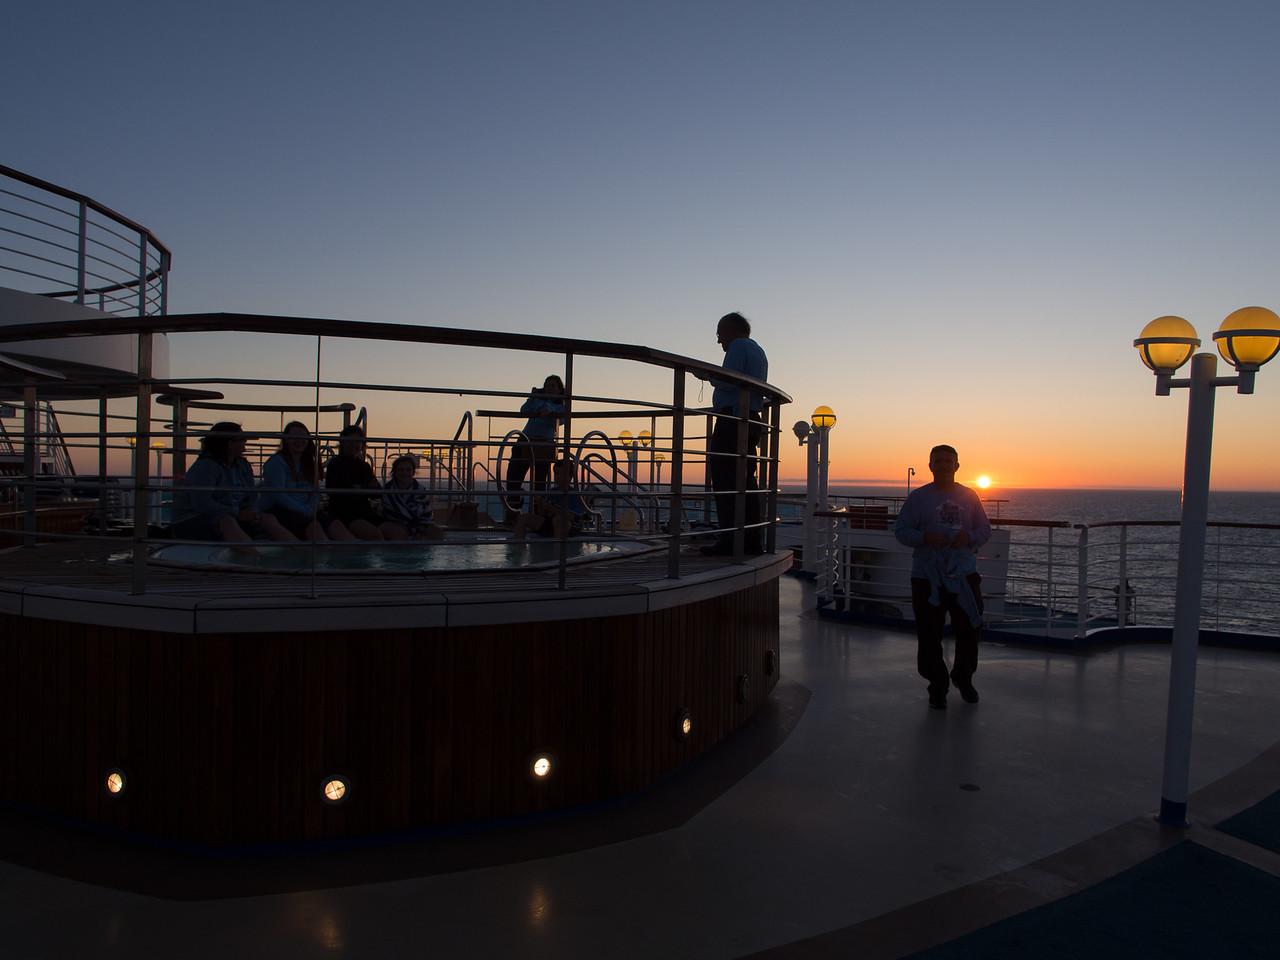 Sunset hot-tubbing